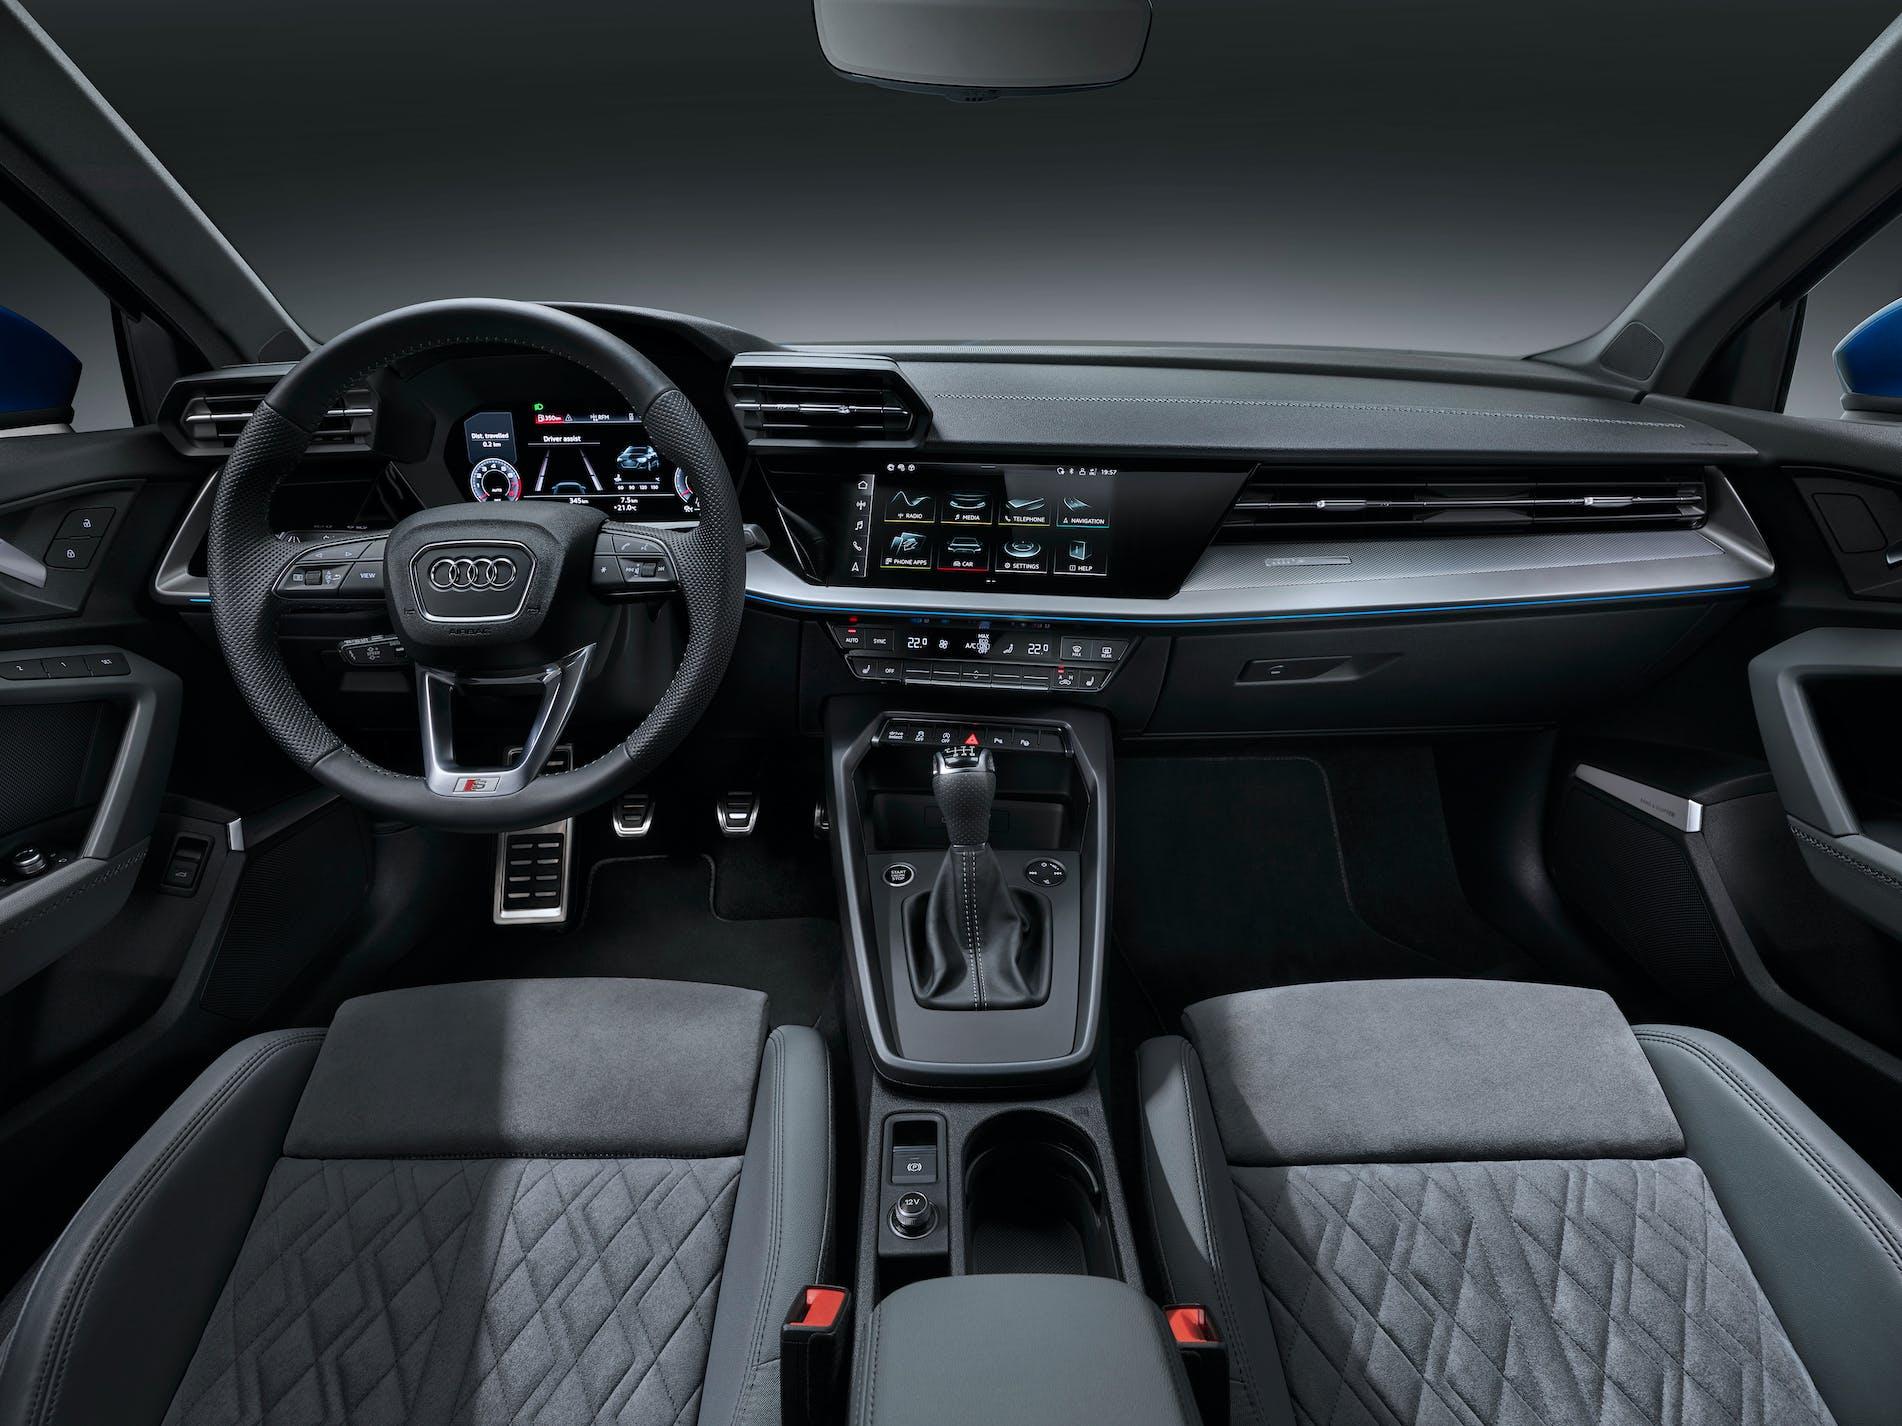 Nuova Audi A3 Sportback plancia